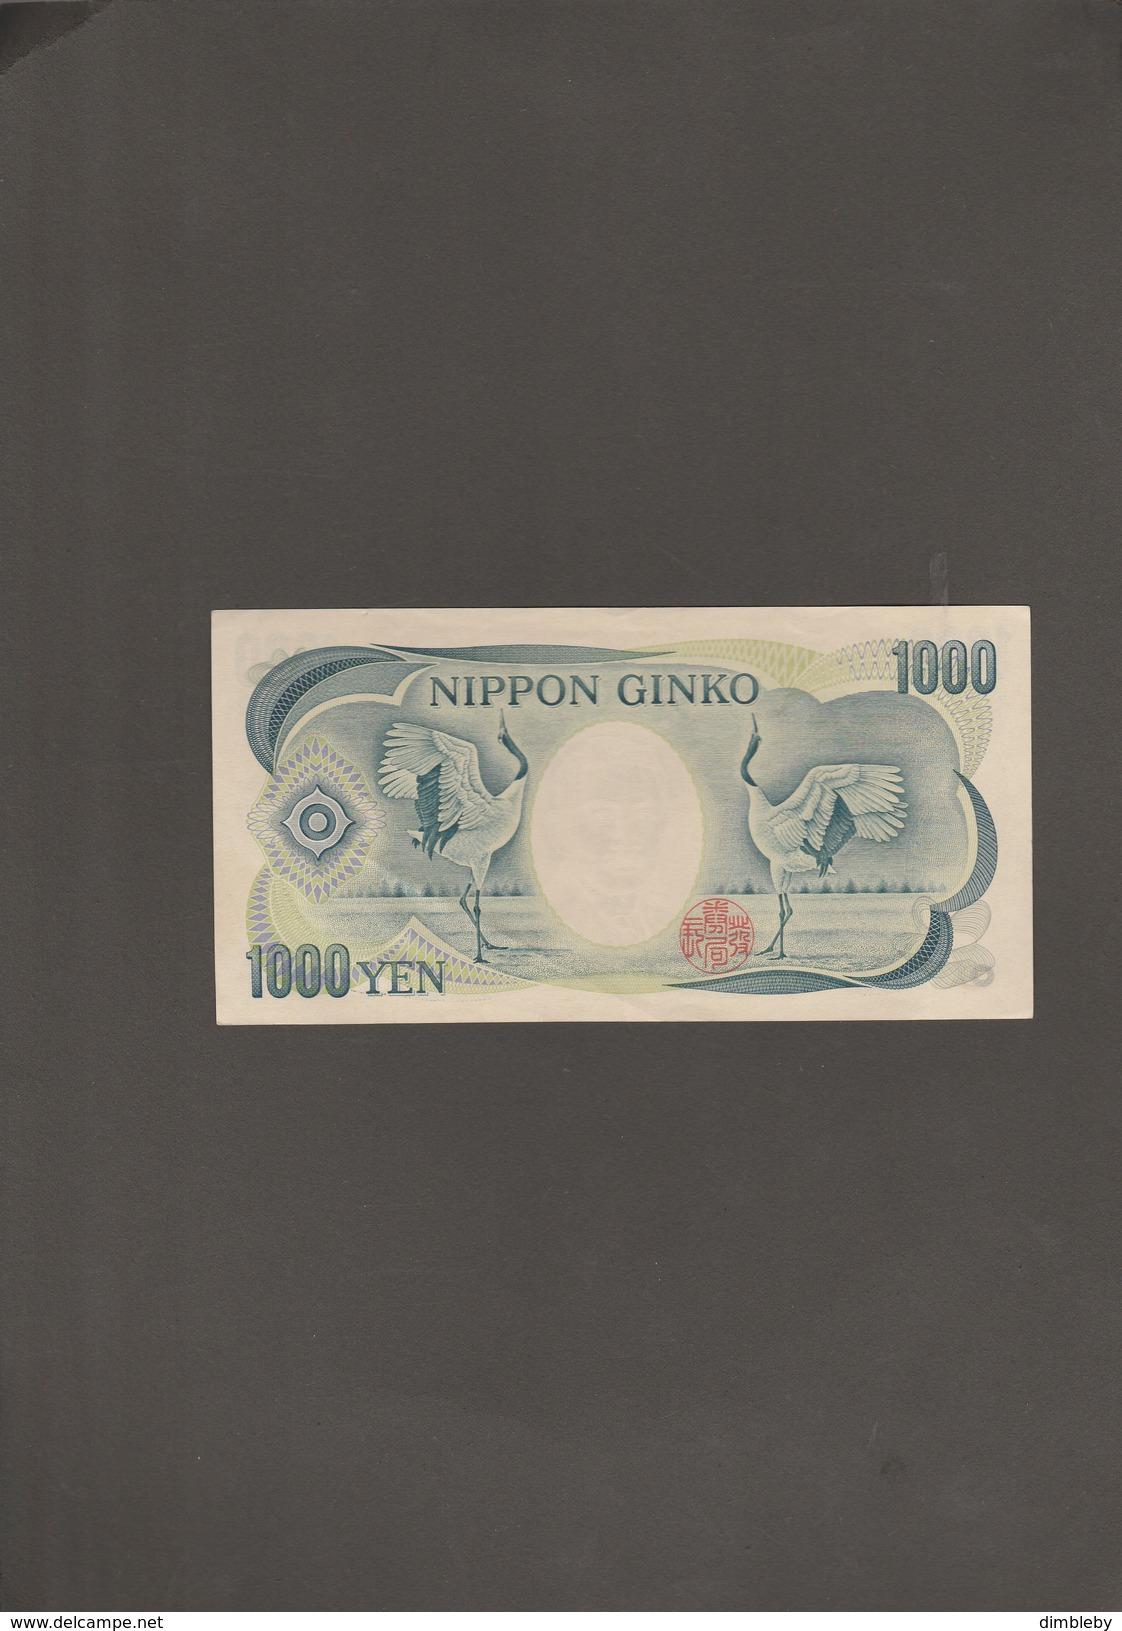 Nippon Ginko 1000 Yen - Japan